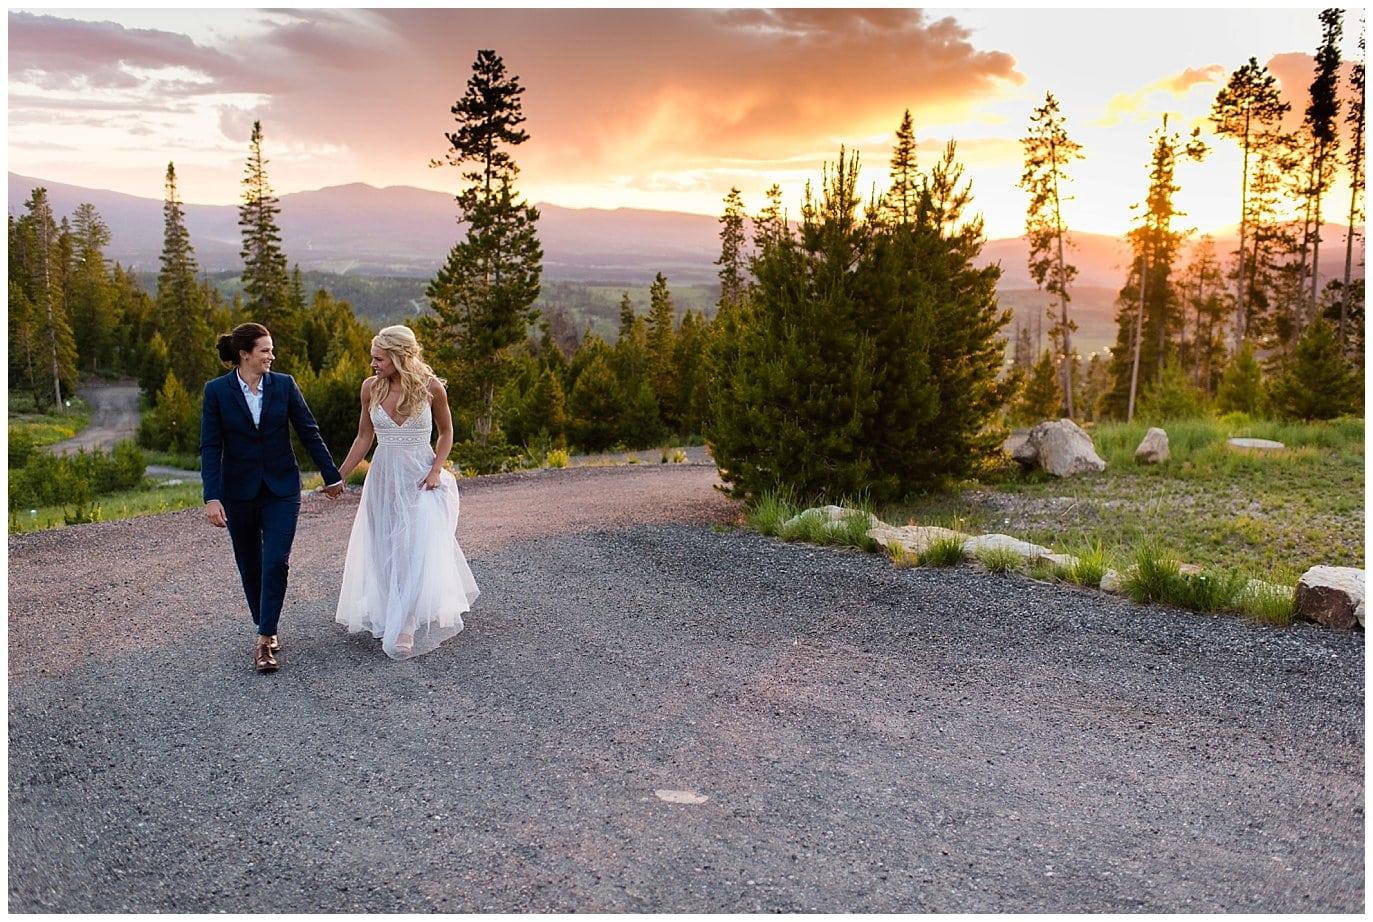 Brides walking at sunset Winter Park Colorado wedding photo